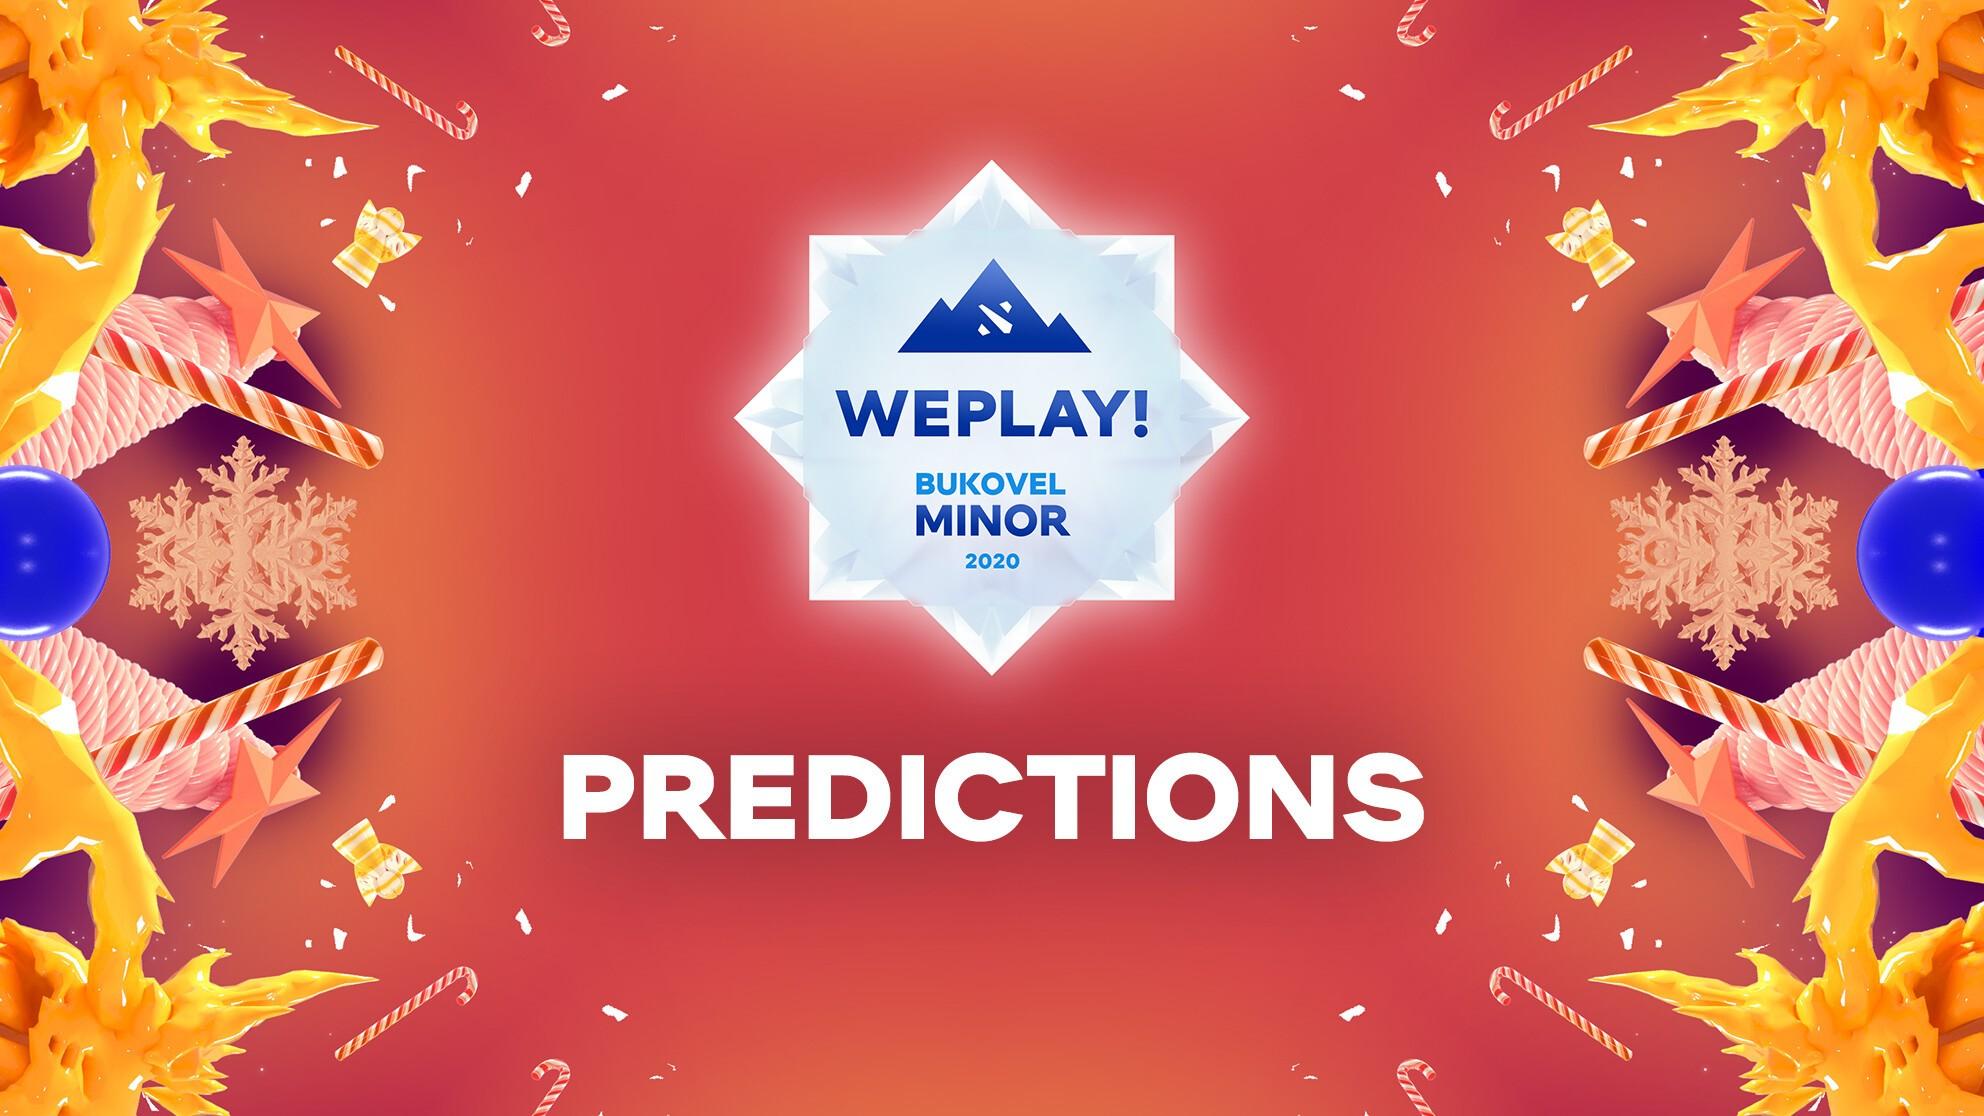 WePlay! Bukovel Minor 2020: Day 2 Predictions